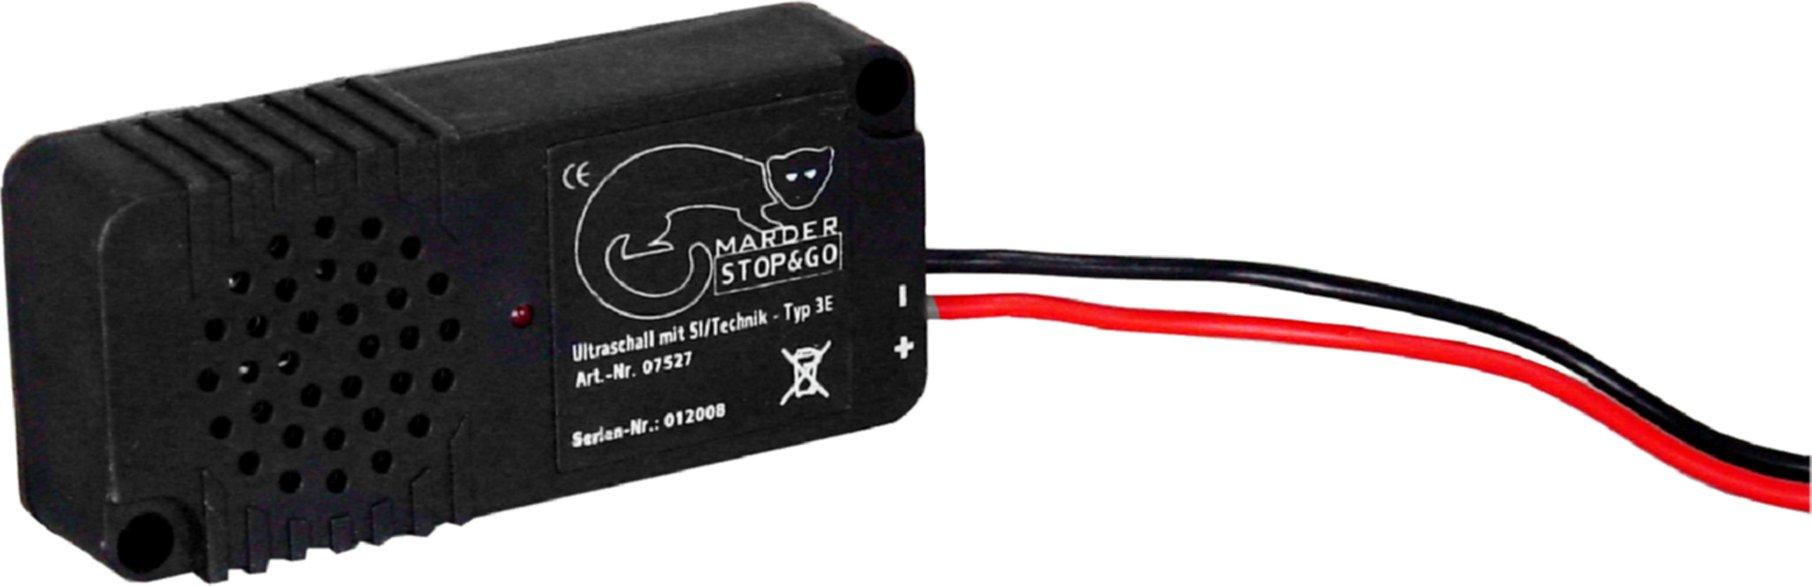 Stop und Go SG7527 Marderabwehr Ultraschall Typ 3 E product image